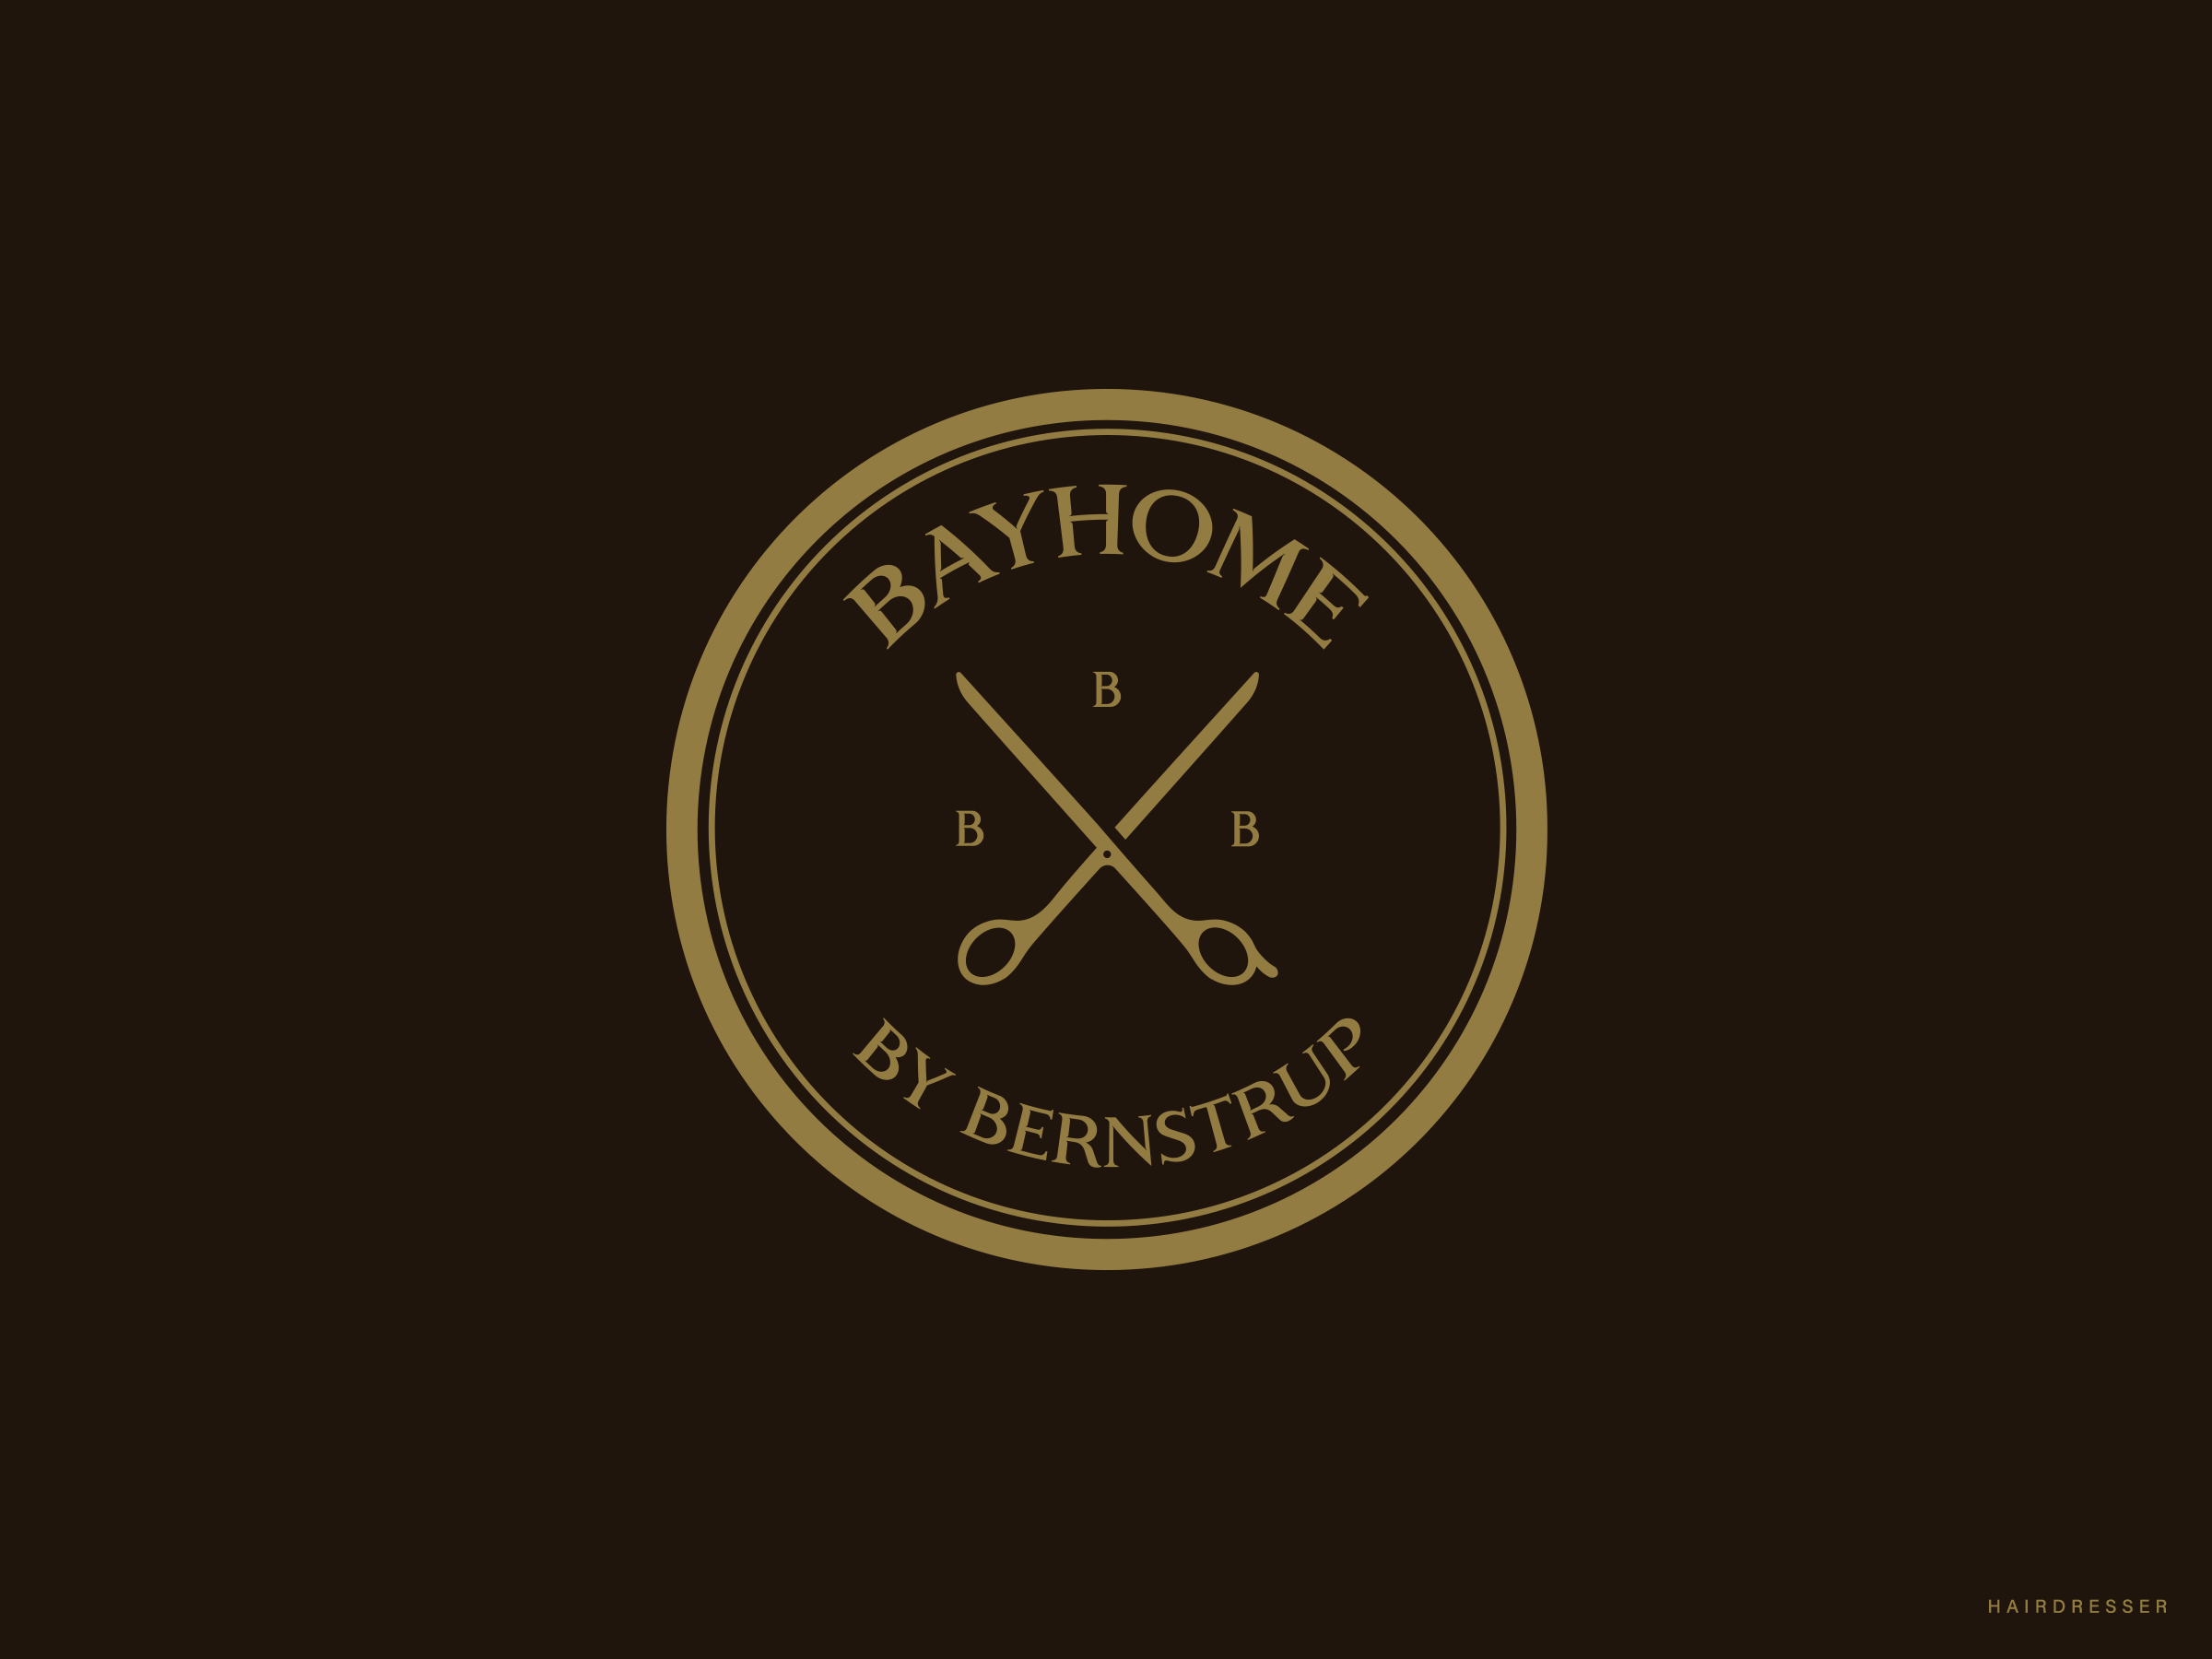 Bayhome by bernstrup